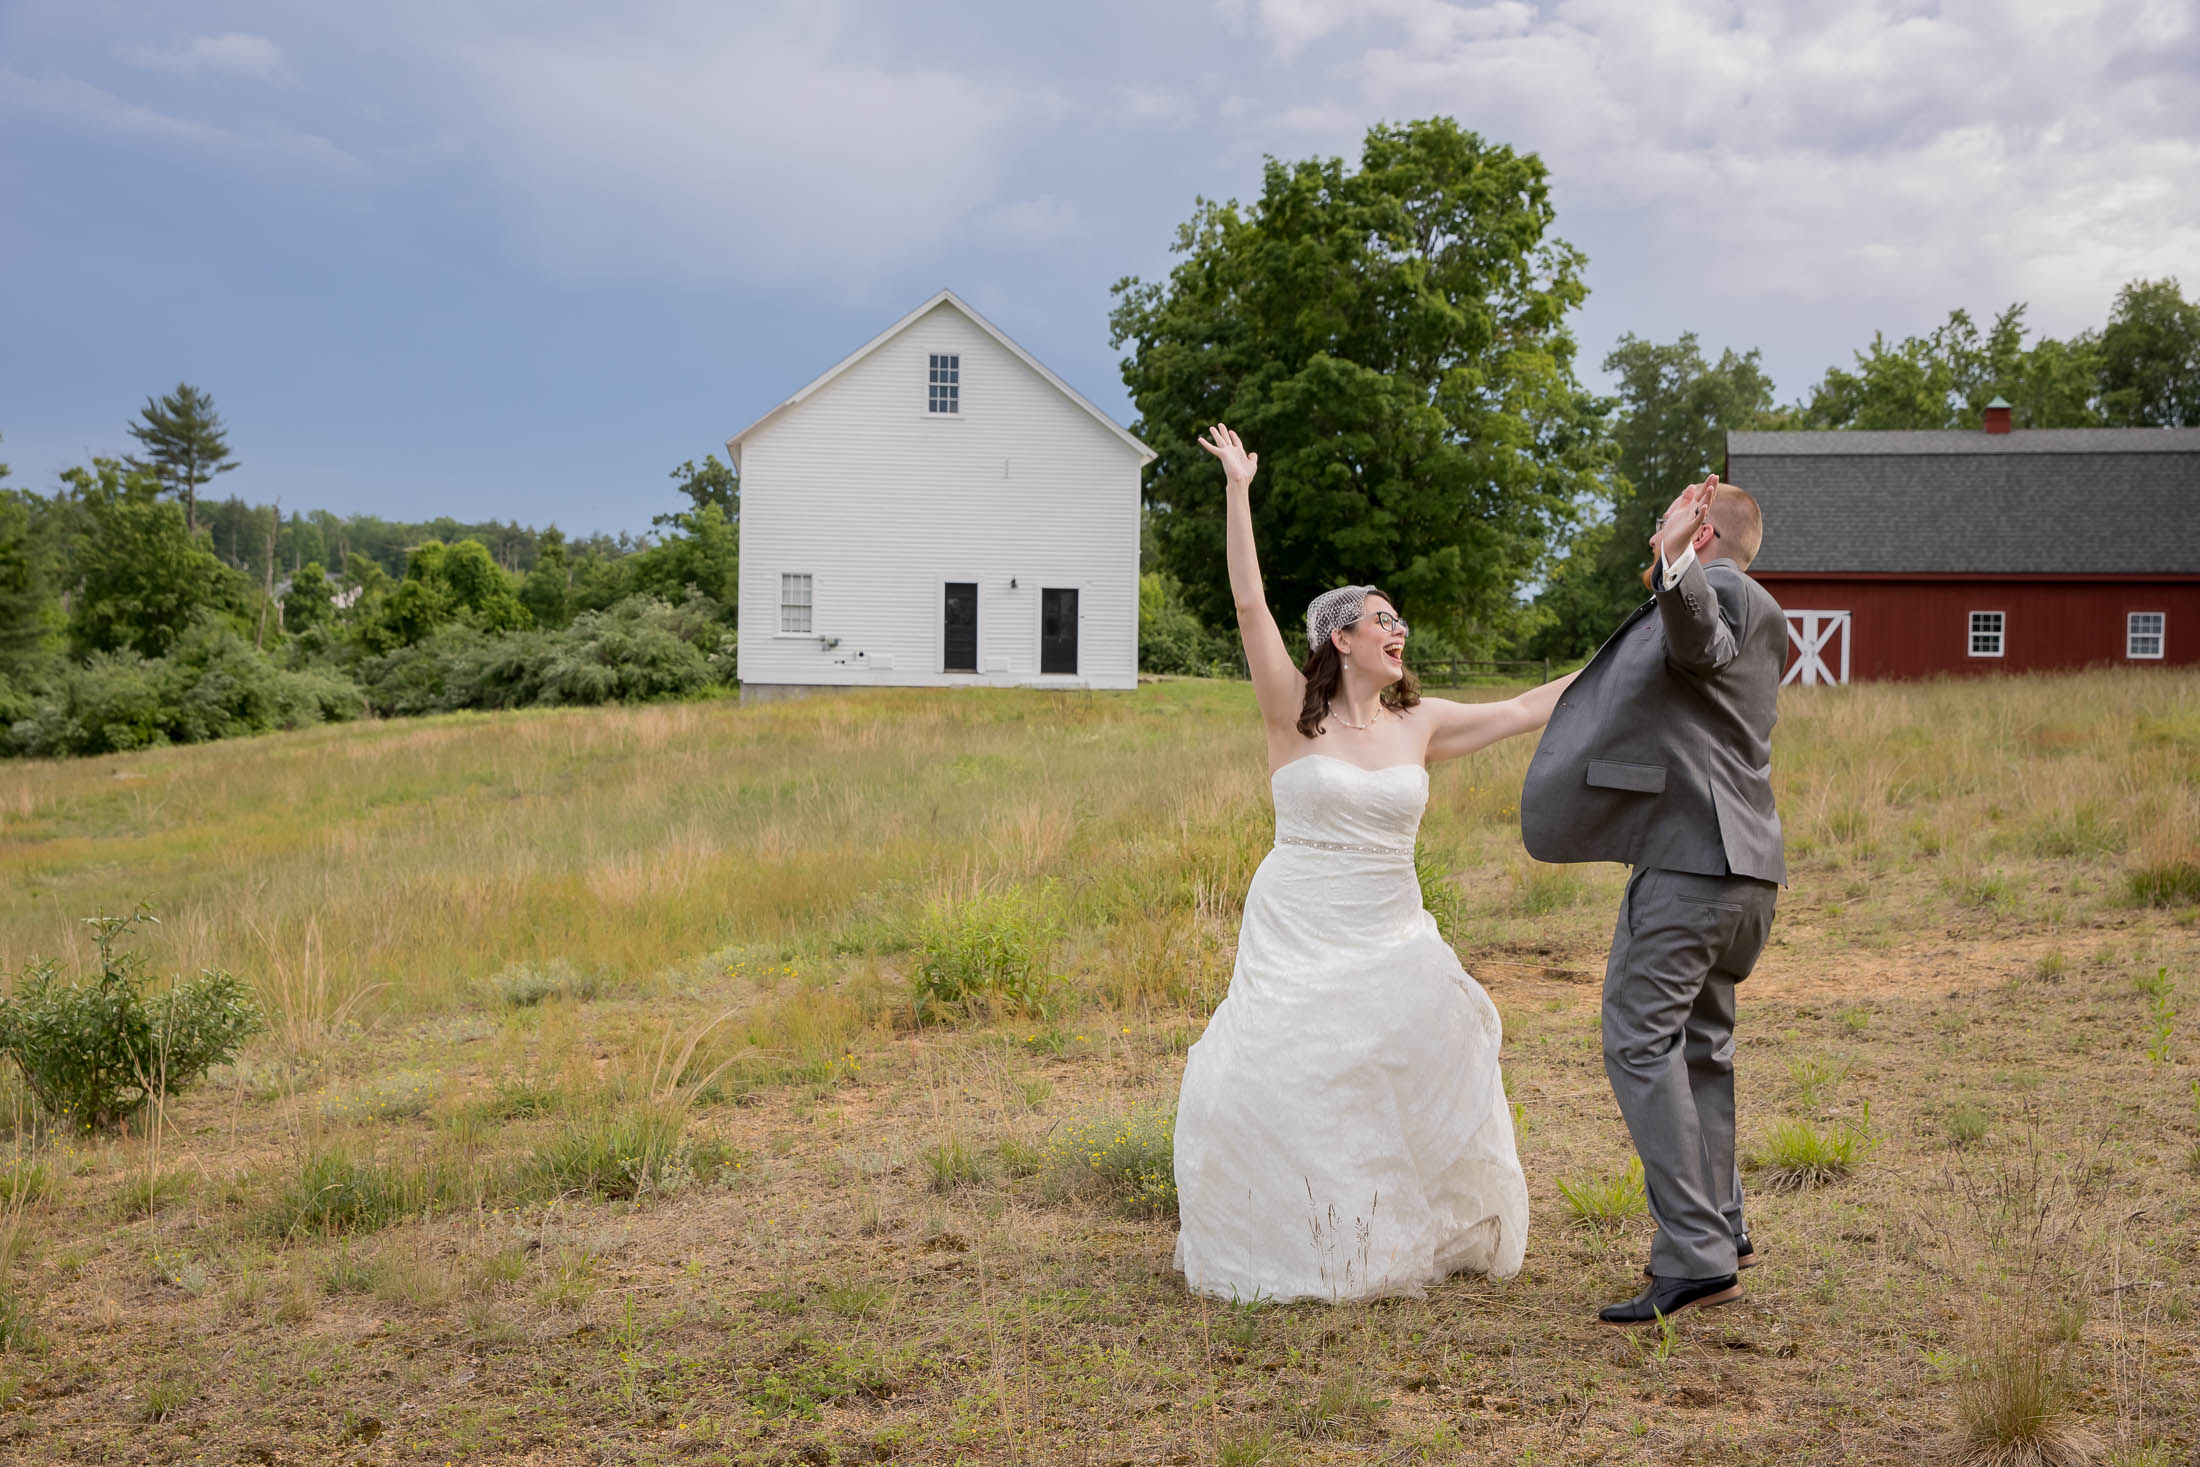 Jump for joy, couple photos, romantic, meadow, wedding, tracy jenkins photography, publick house, Massachusetts, new england,  photography